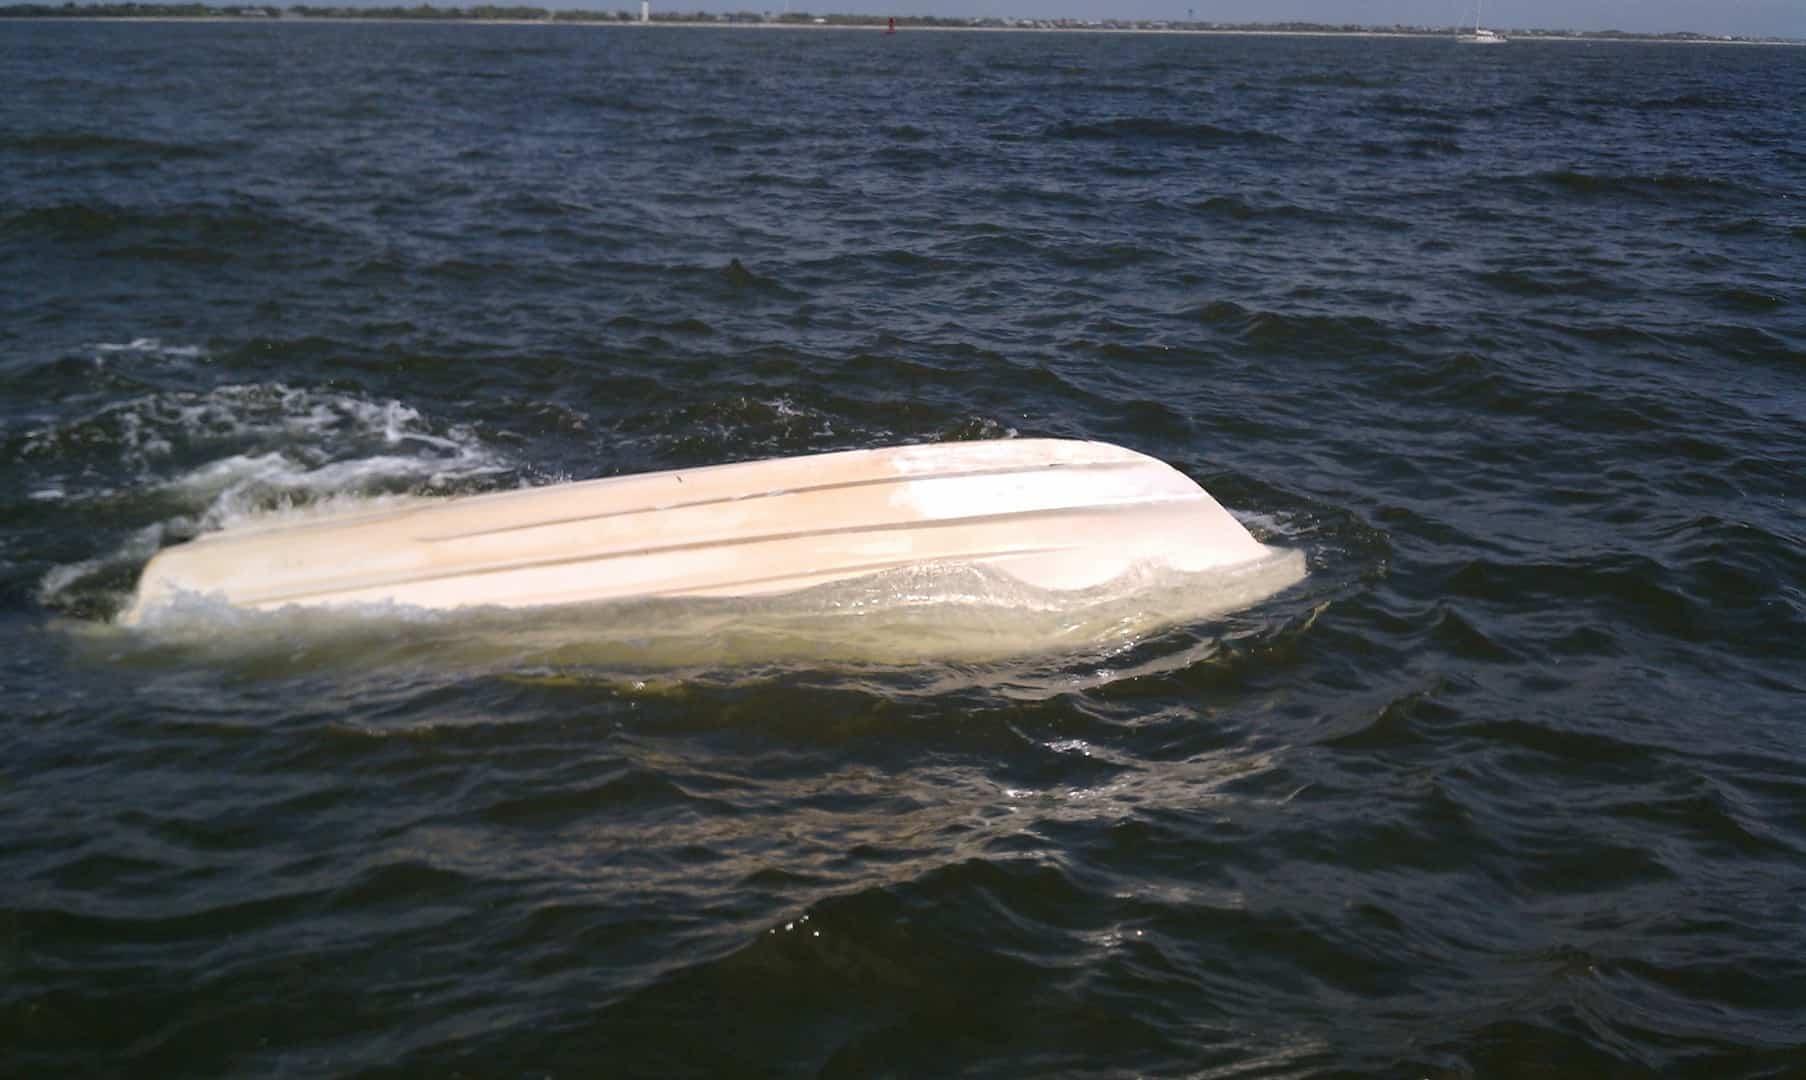 Boating Safety – Marine VHF Radios